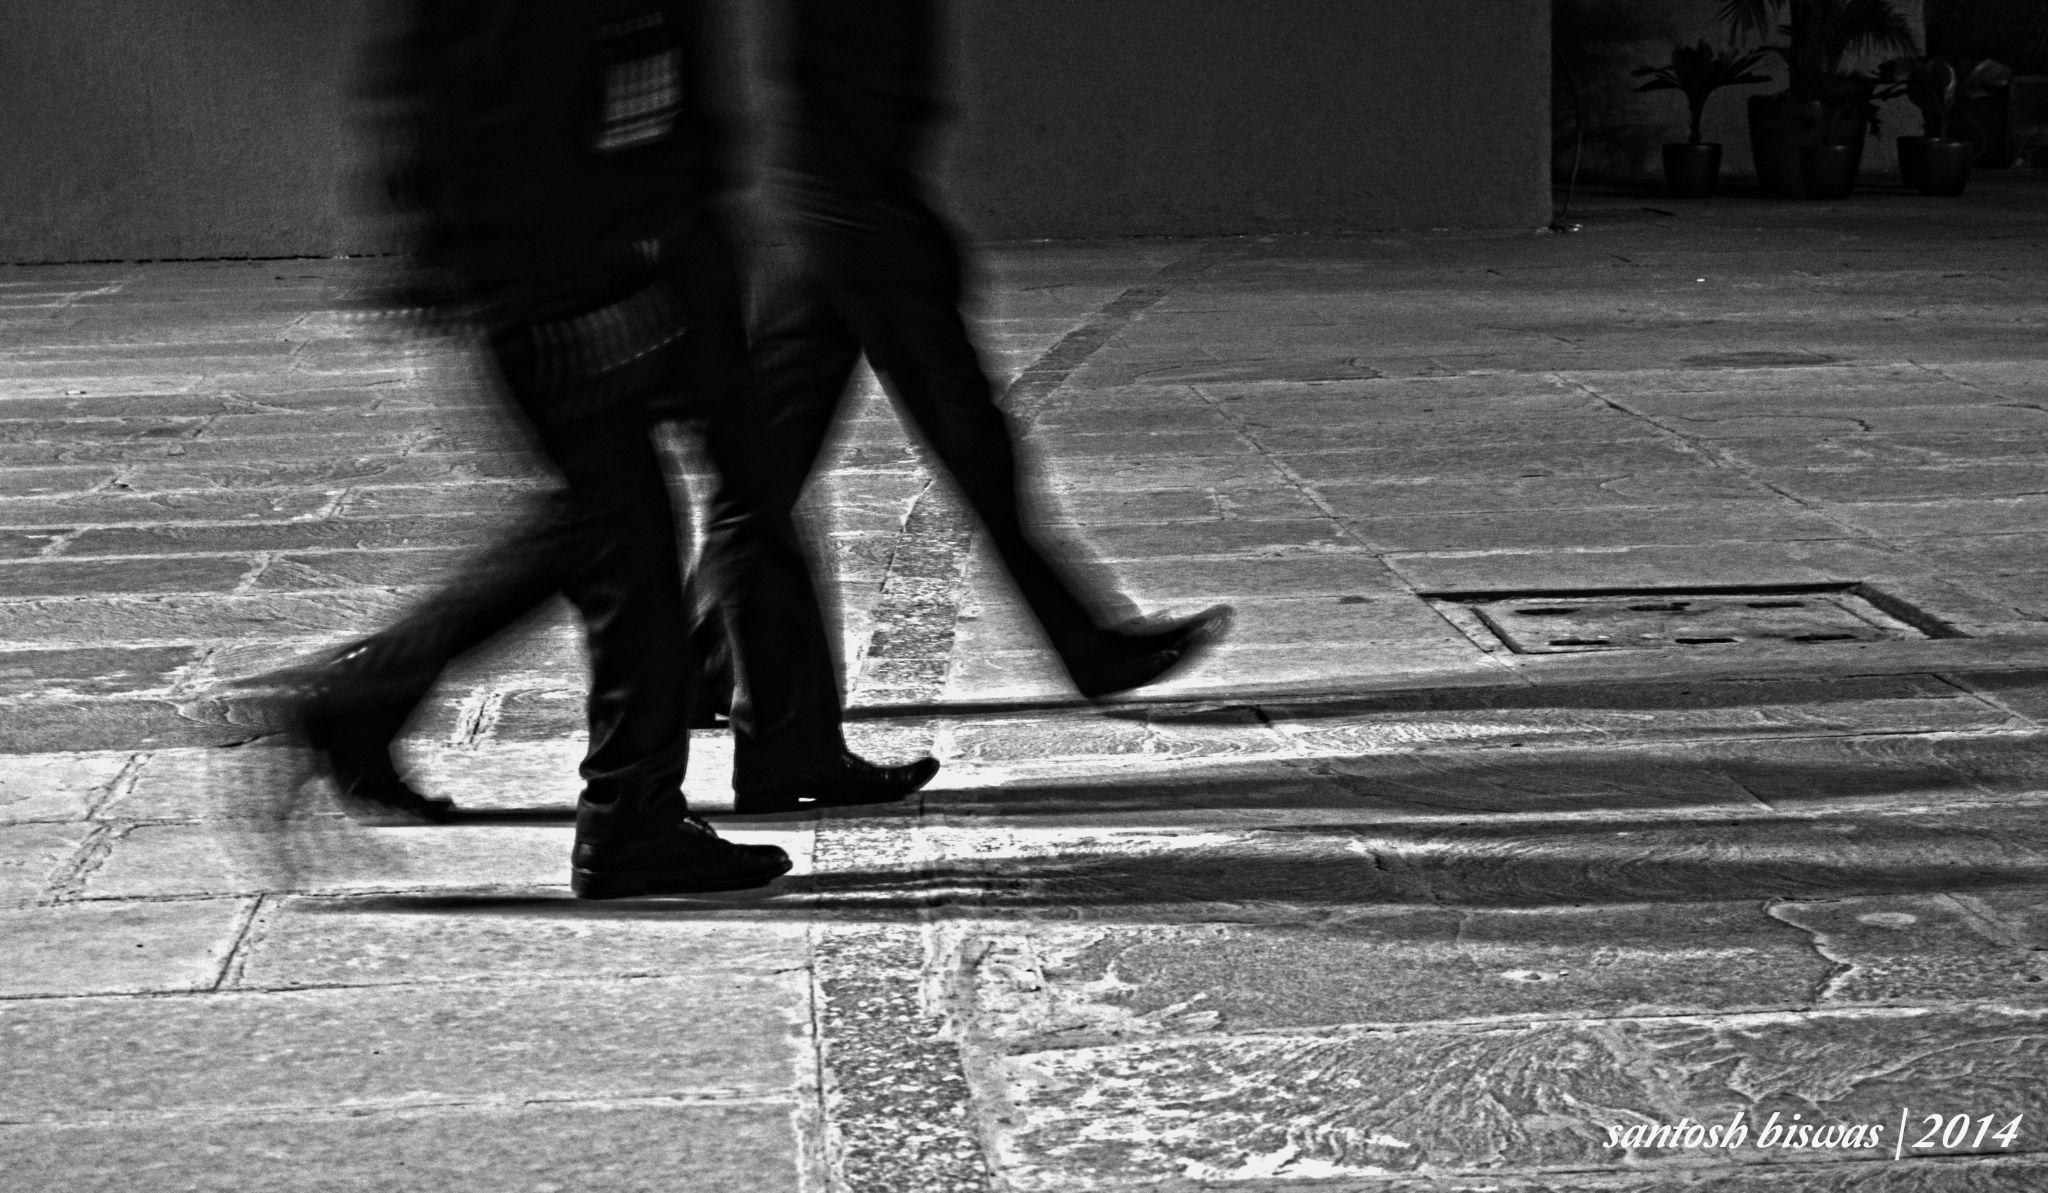 walk together by Santosh Biswas